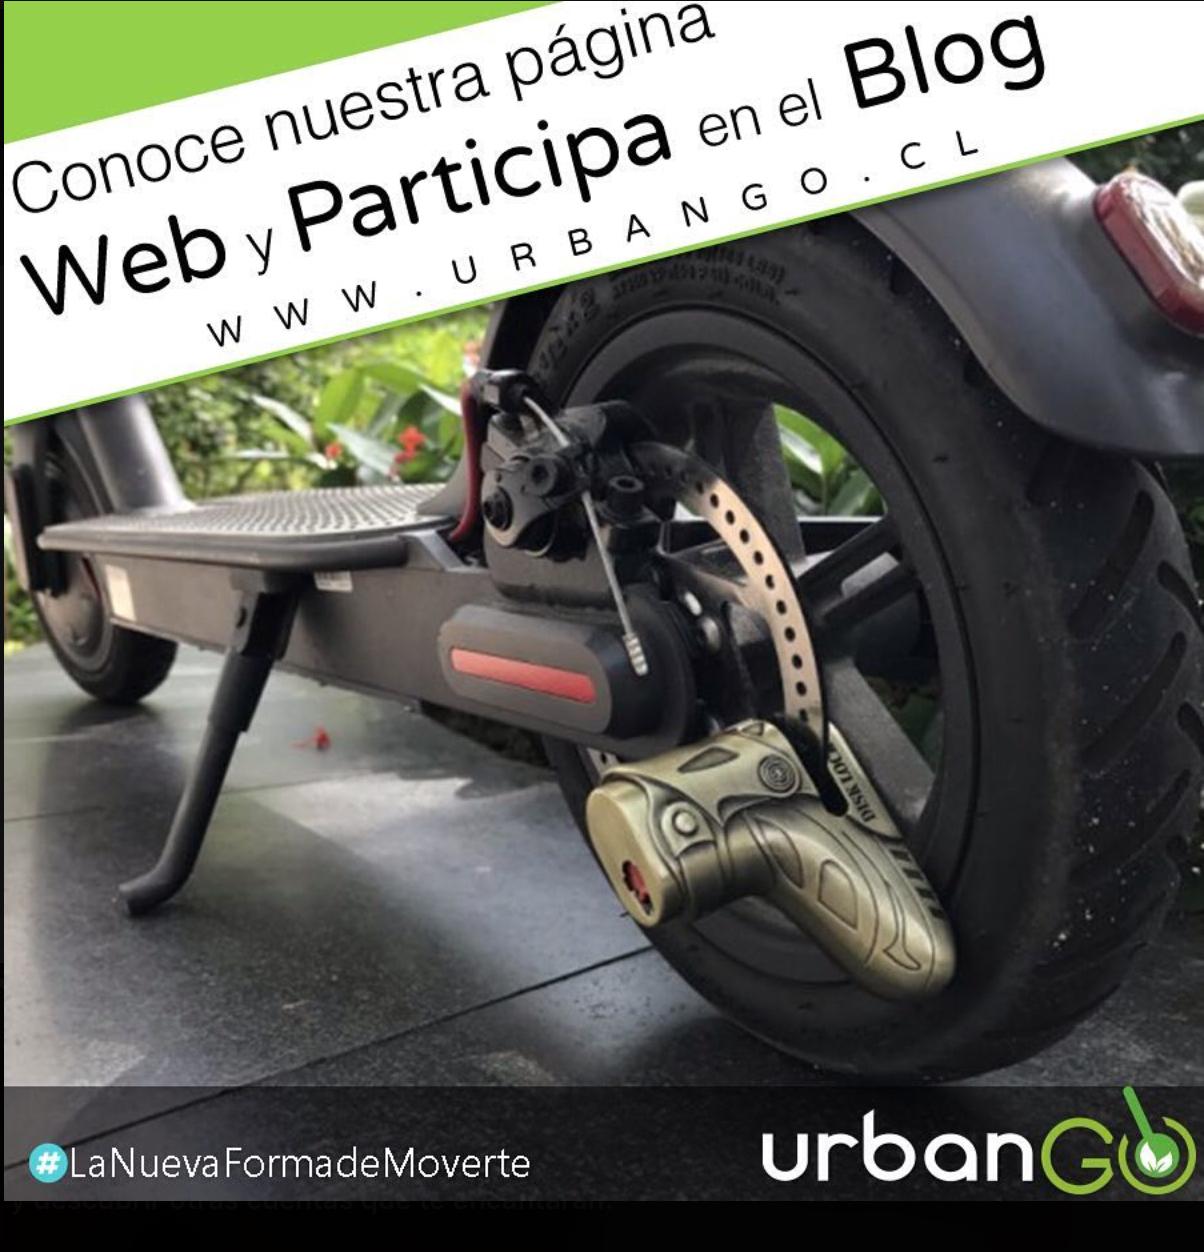 Portada UrbanGO